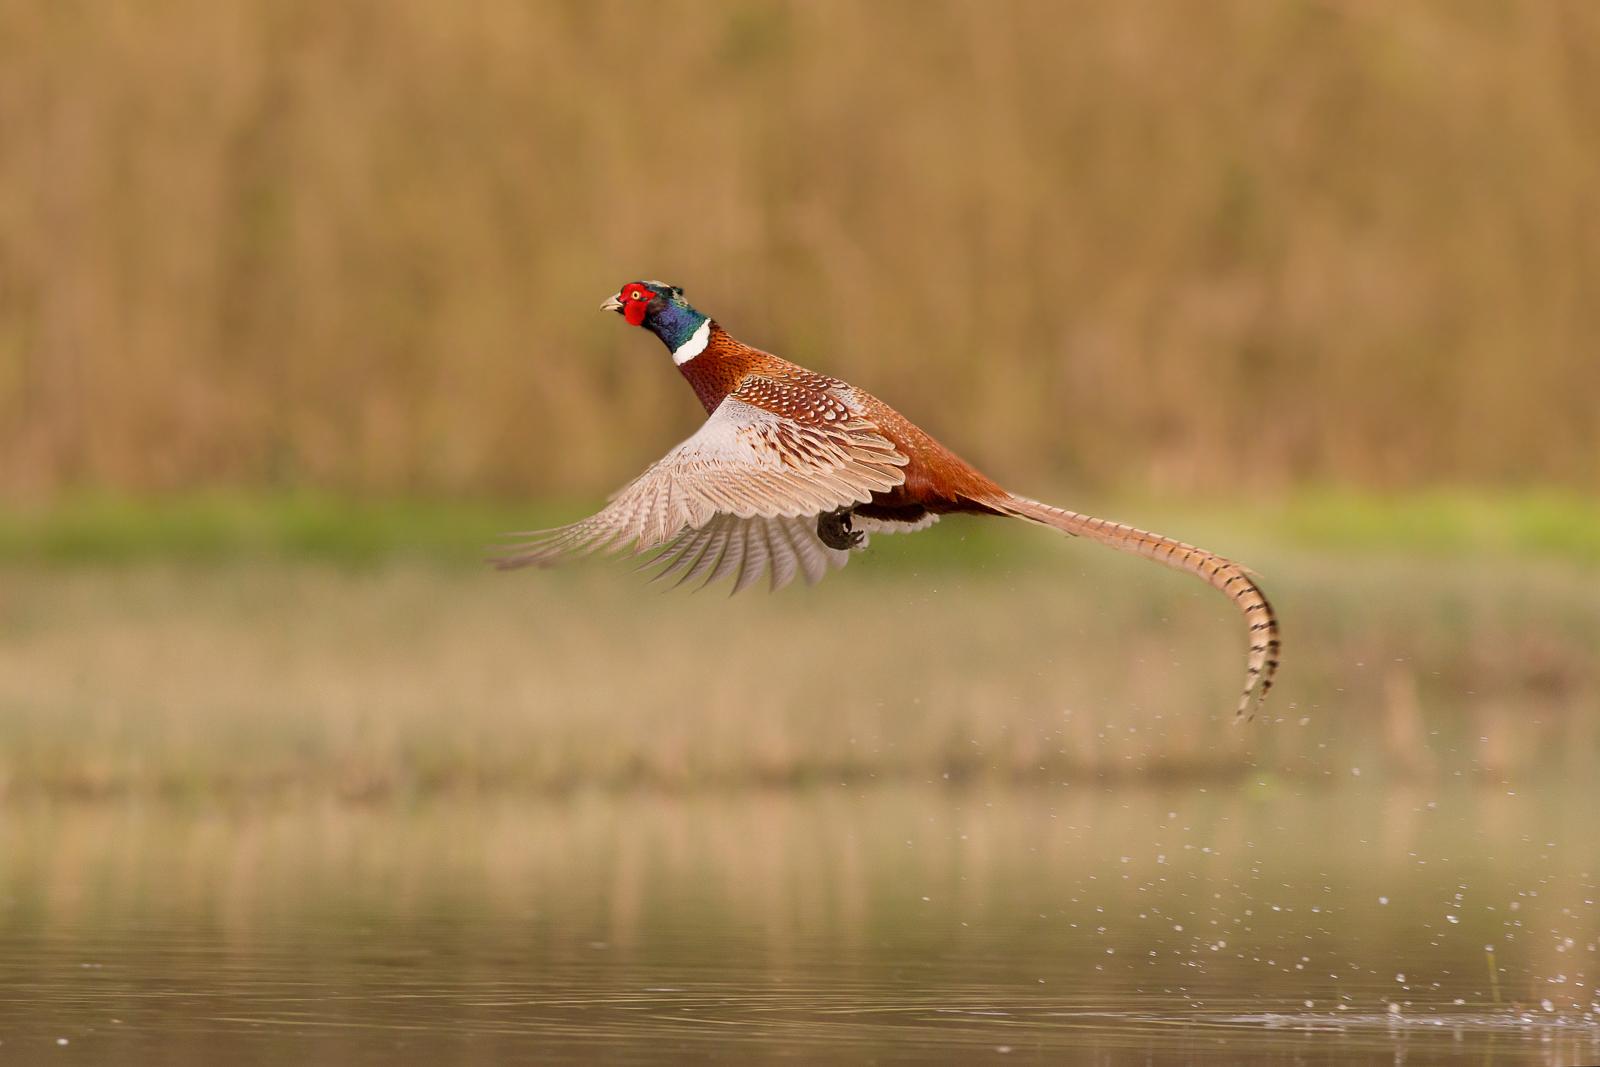 The Pheasant...